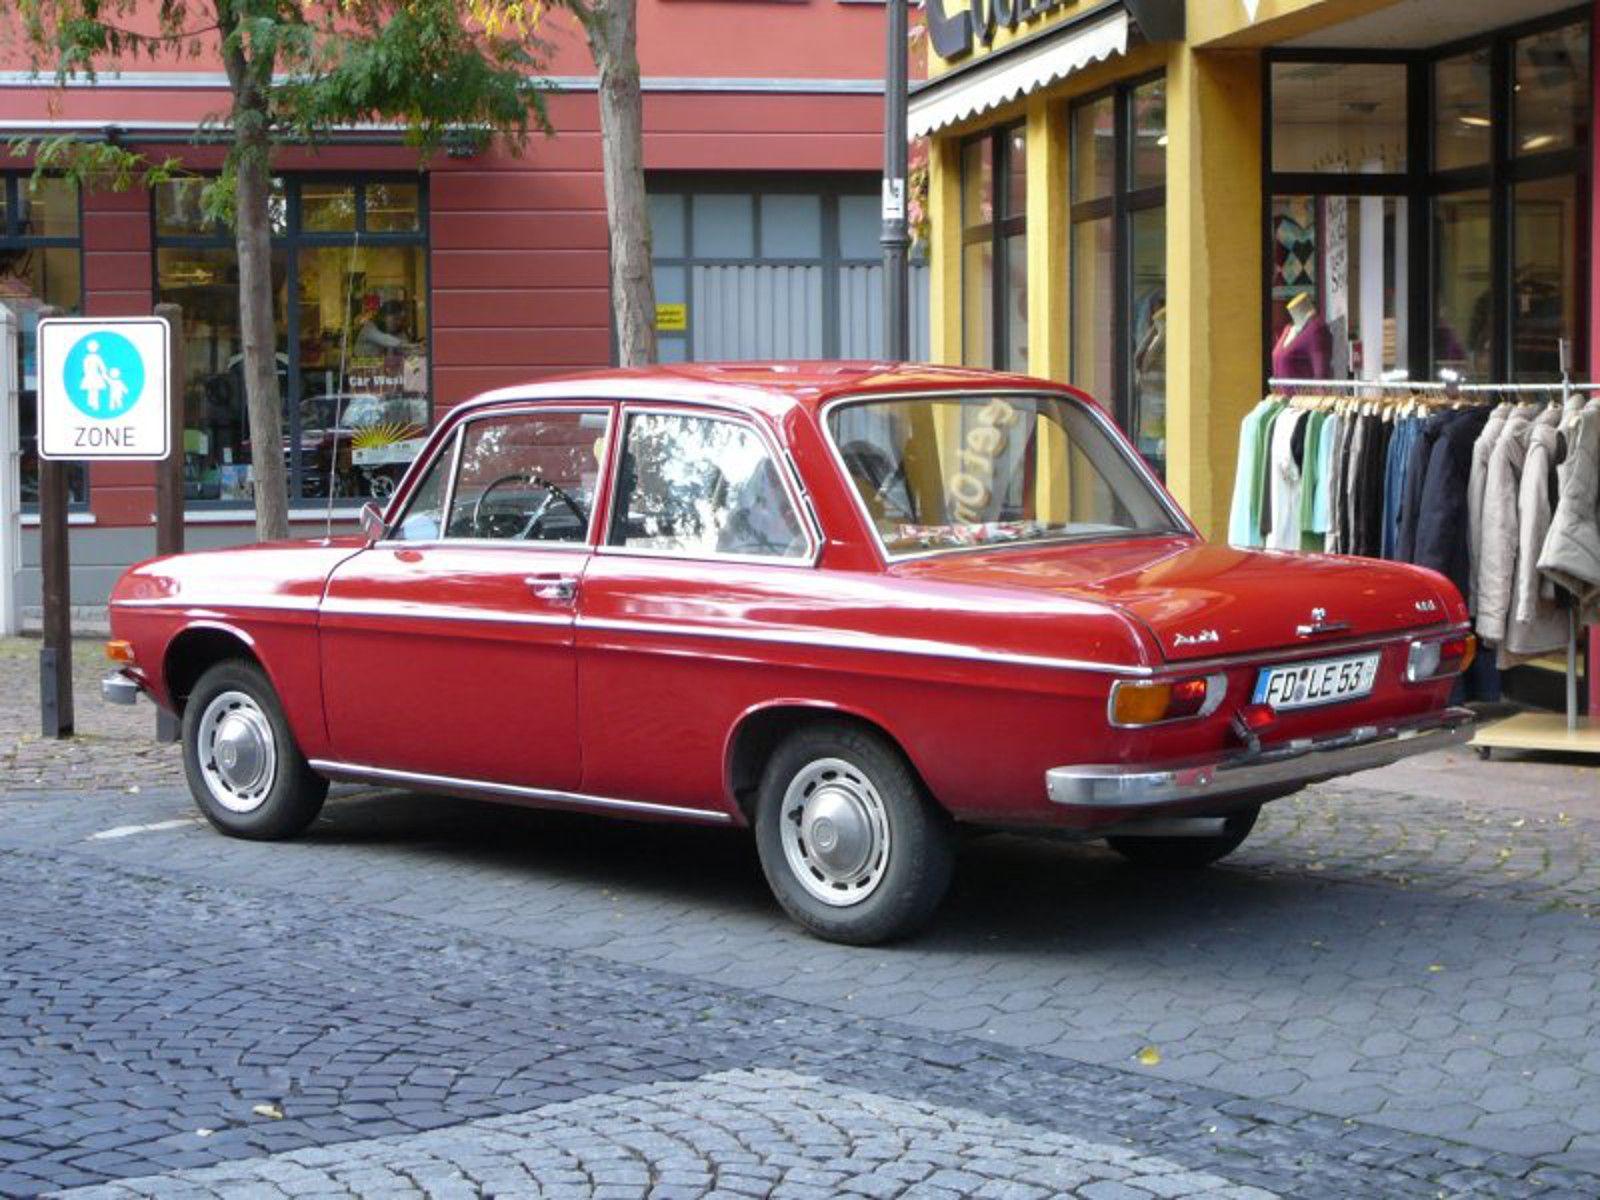 Audi Deutsch Autos Pinterest Cars Mopeds And Dream Cars - Vintage audi cars